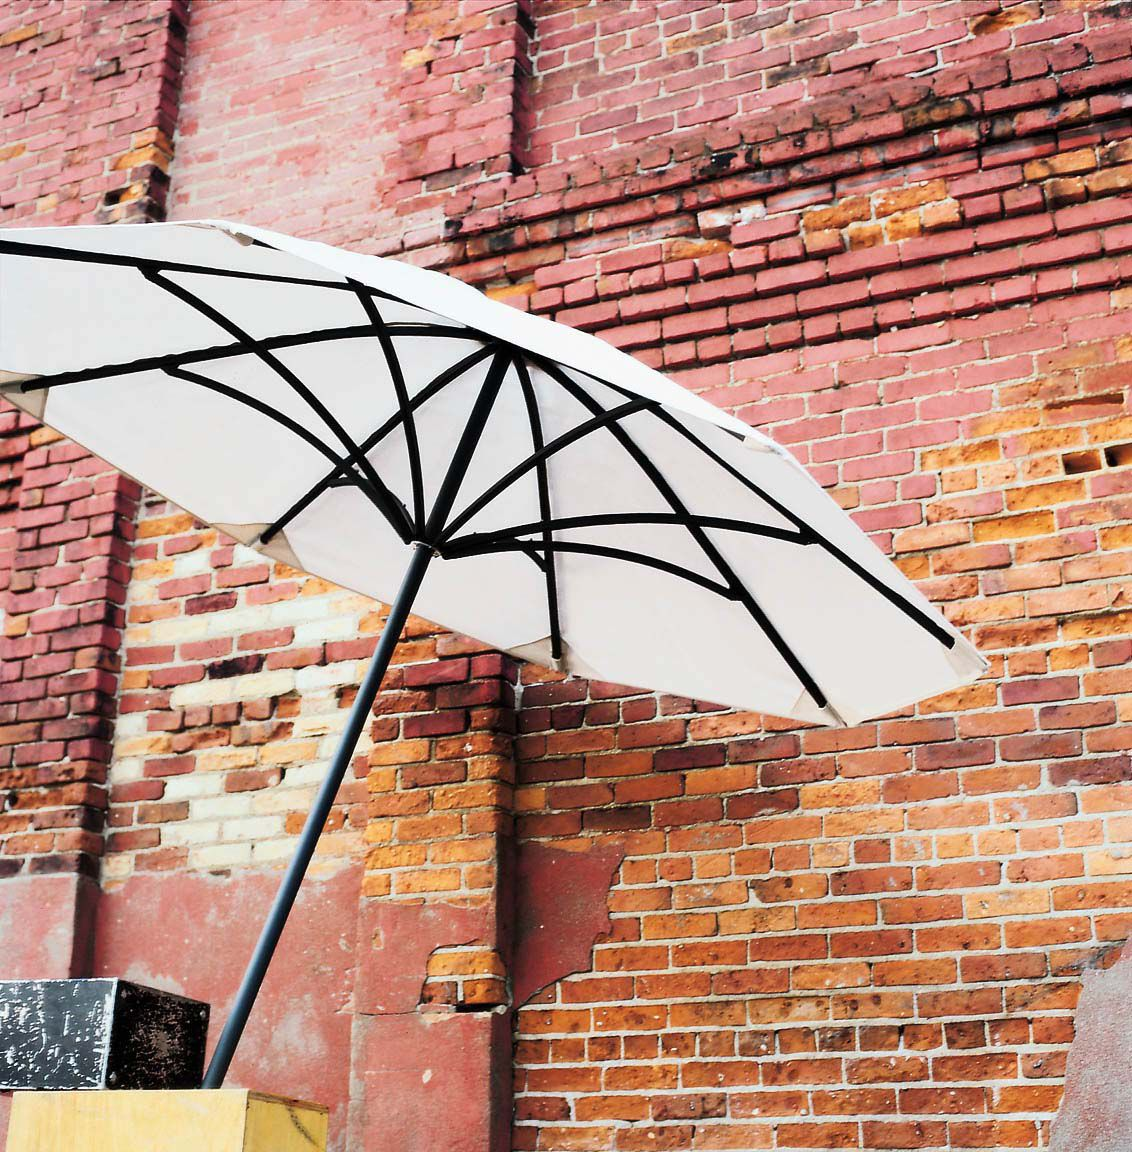 Equinox Umbrella #landscapeforms #sitefurniture #outdoorfurniture #landscapearchitect